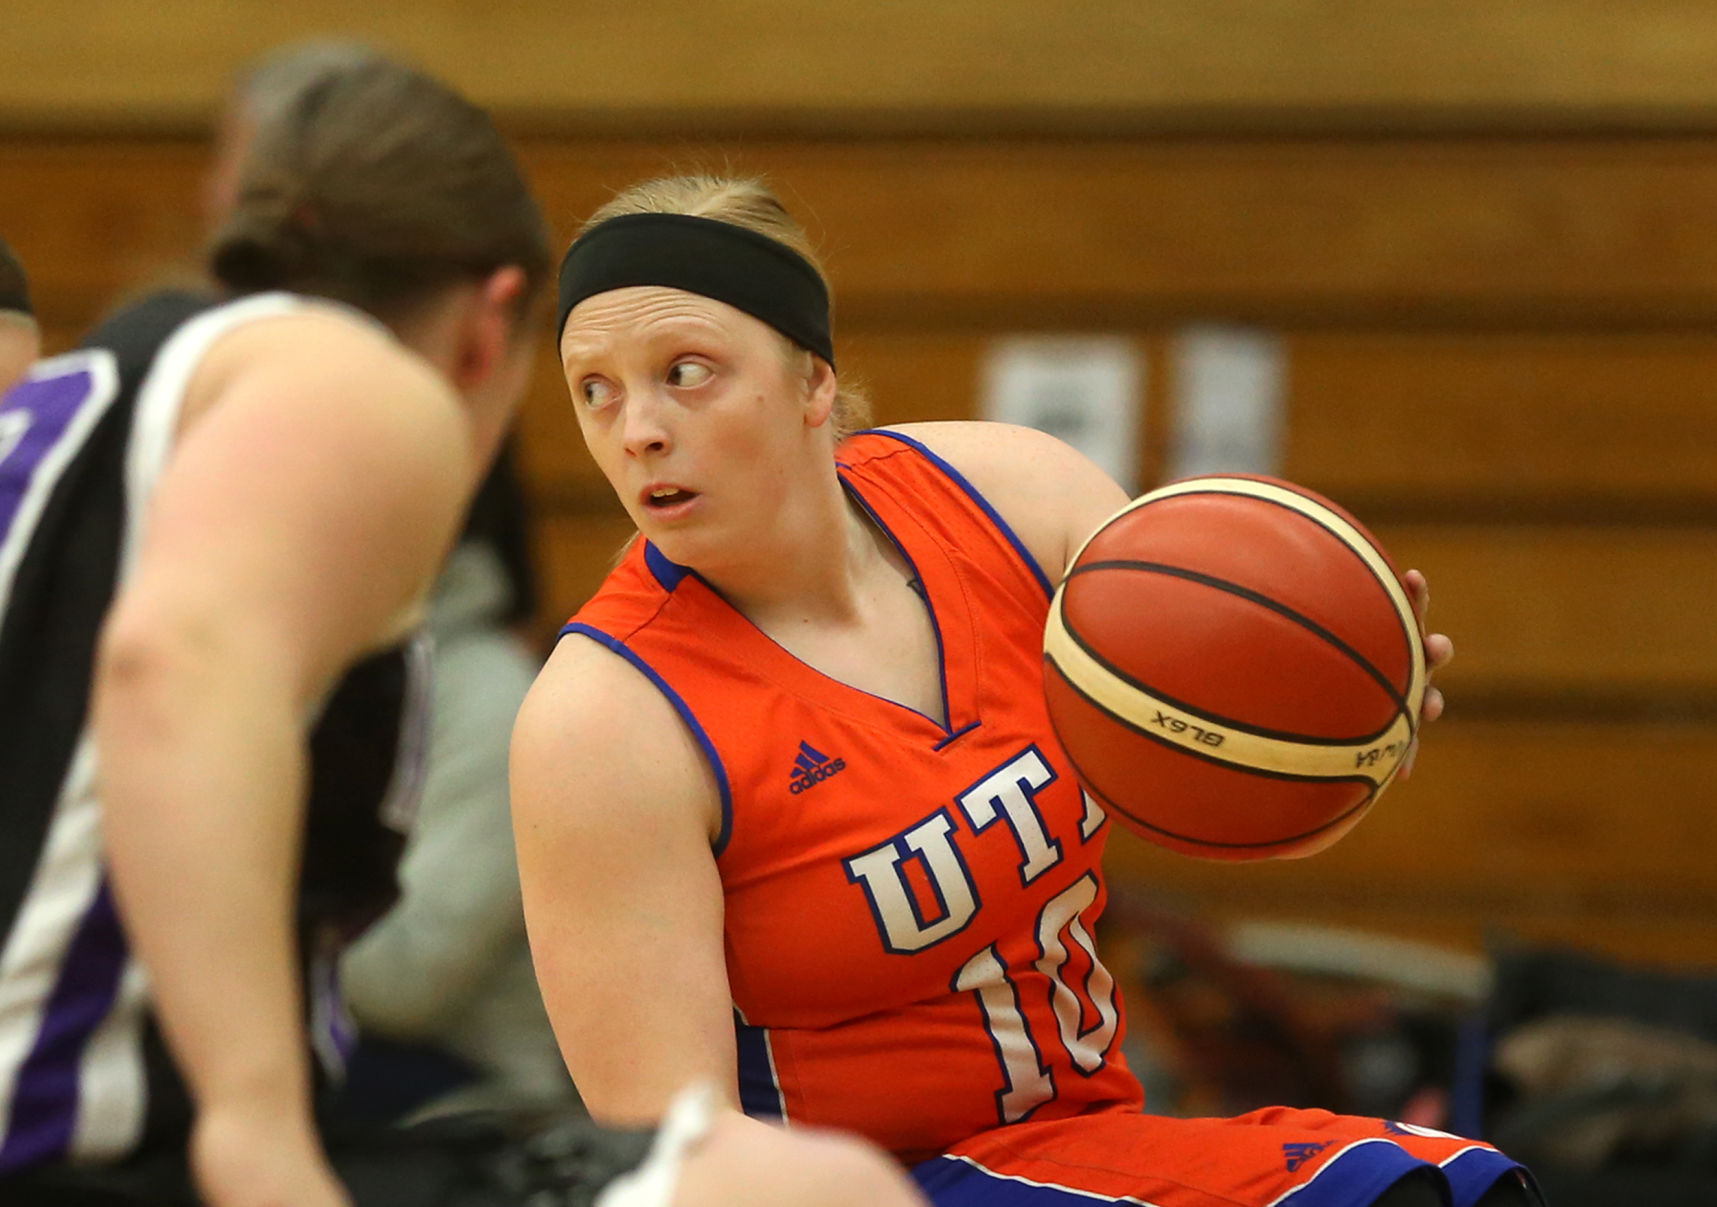 UTA Lady Movin' Mavs defeats University of Wisconsin-Whitewater in tournament